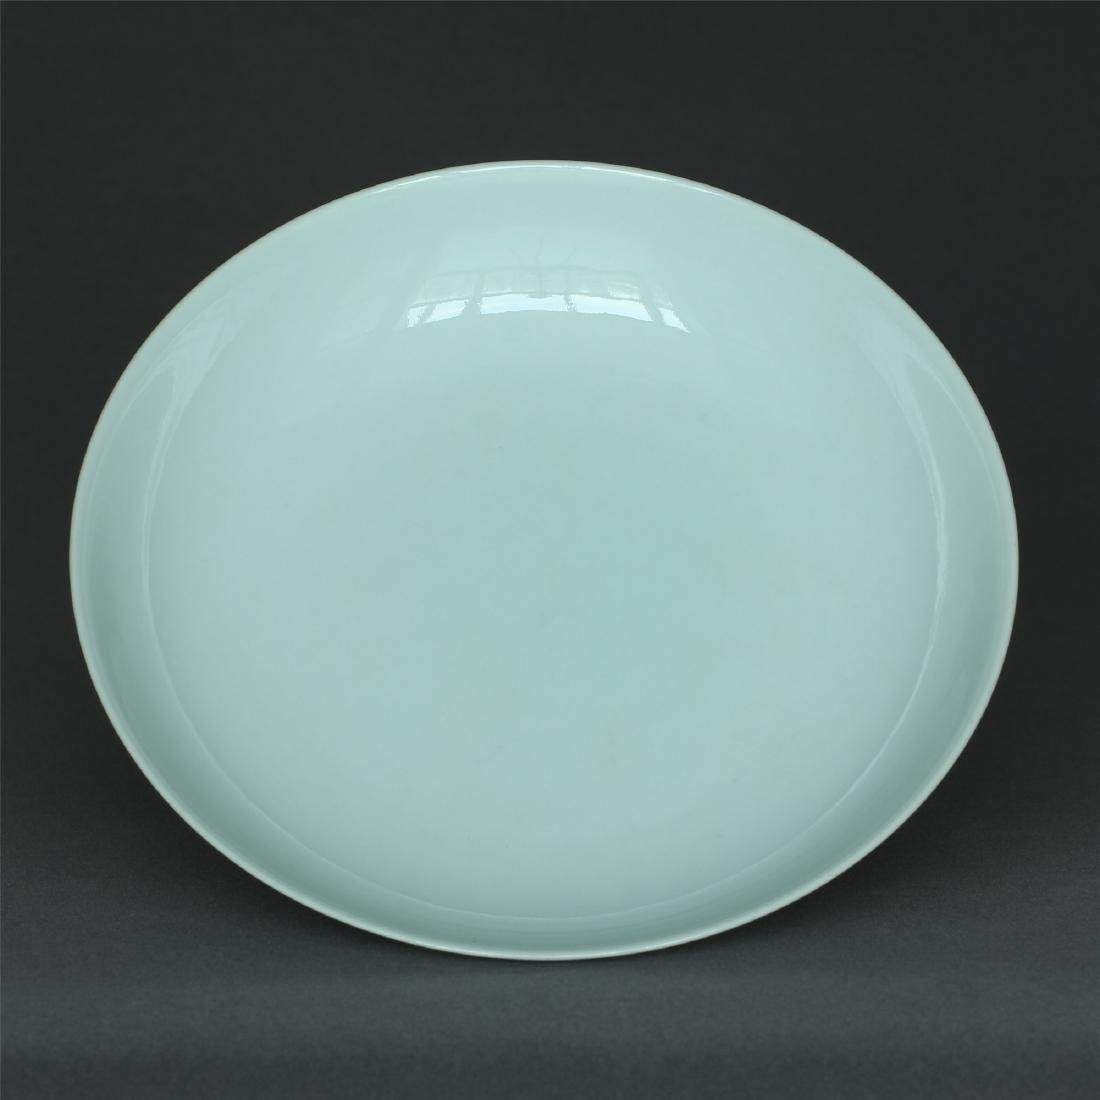 Gray glaze porcelain plate of Qing Dynasty QianLong